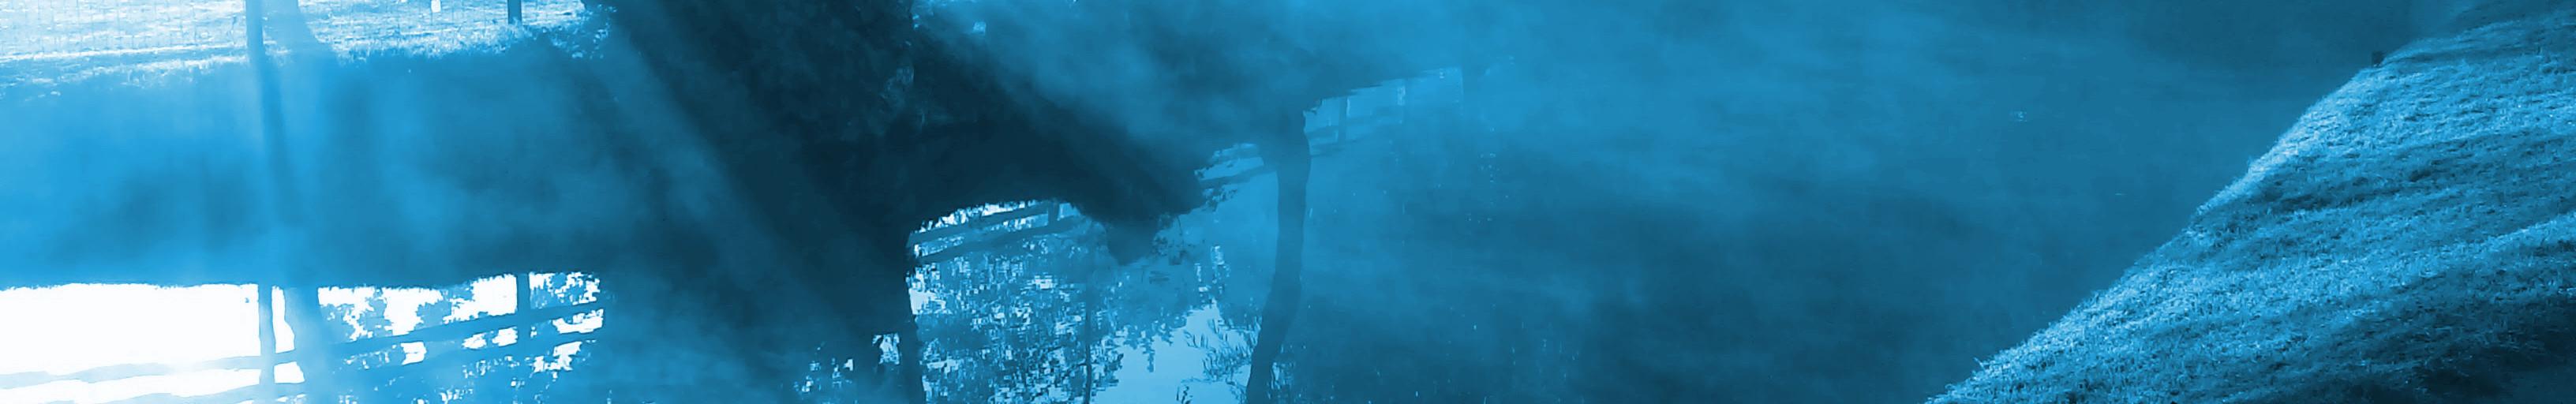 ground near calm stream sun streams through blue fog